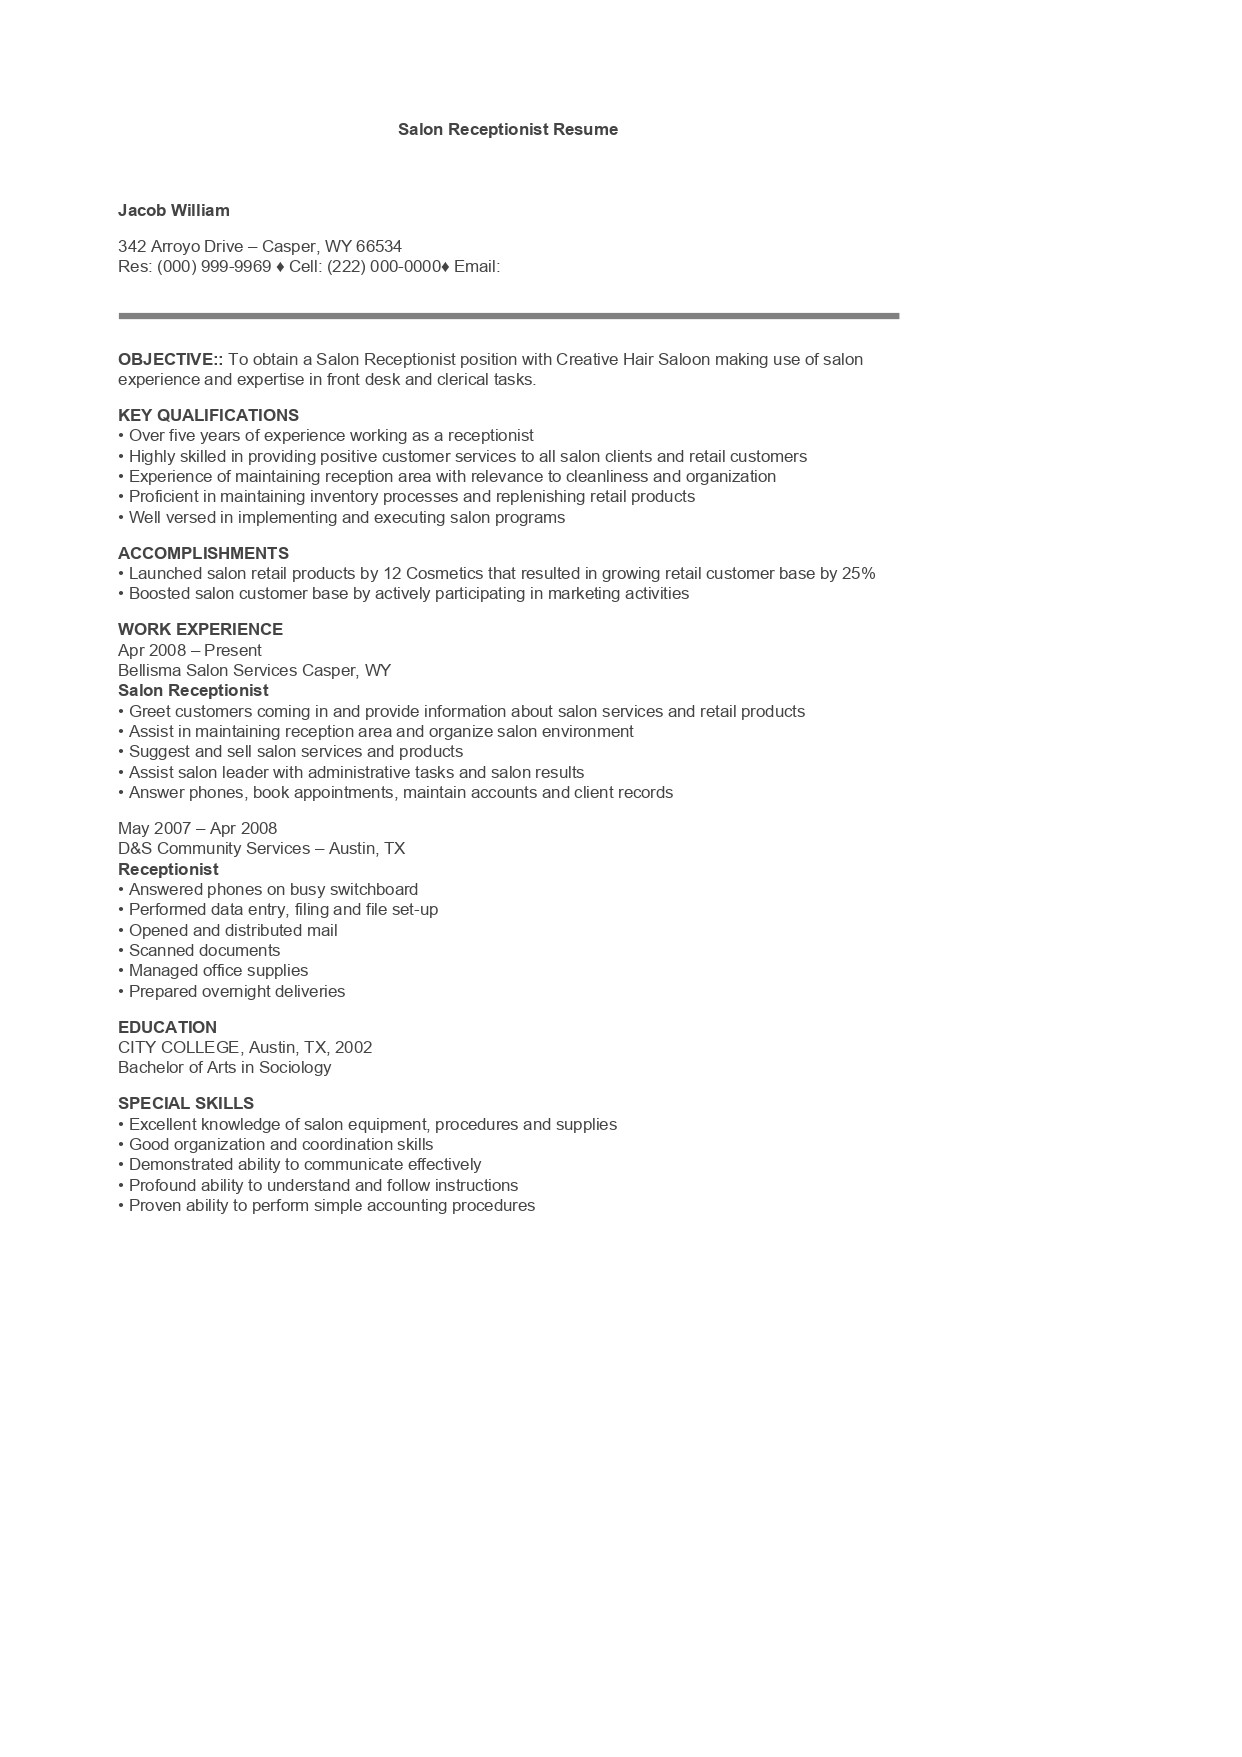 Hair Salon Receptionist Resume Salon Receptionist Resume